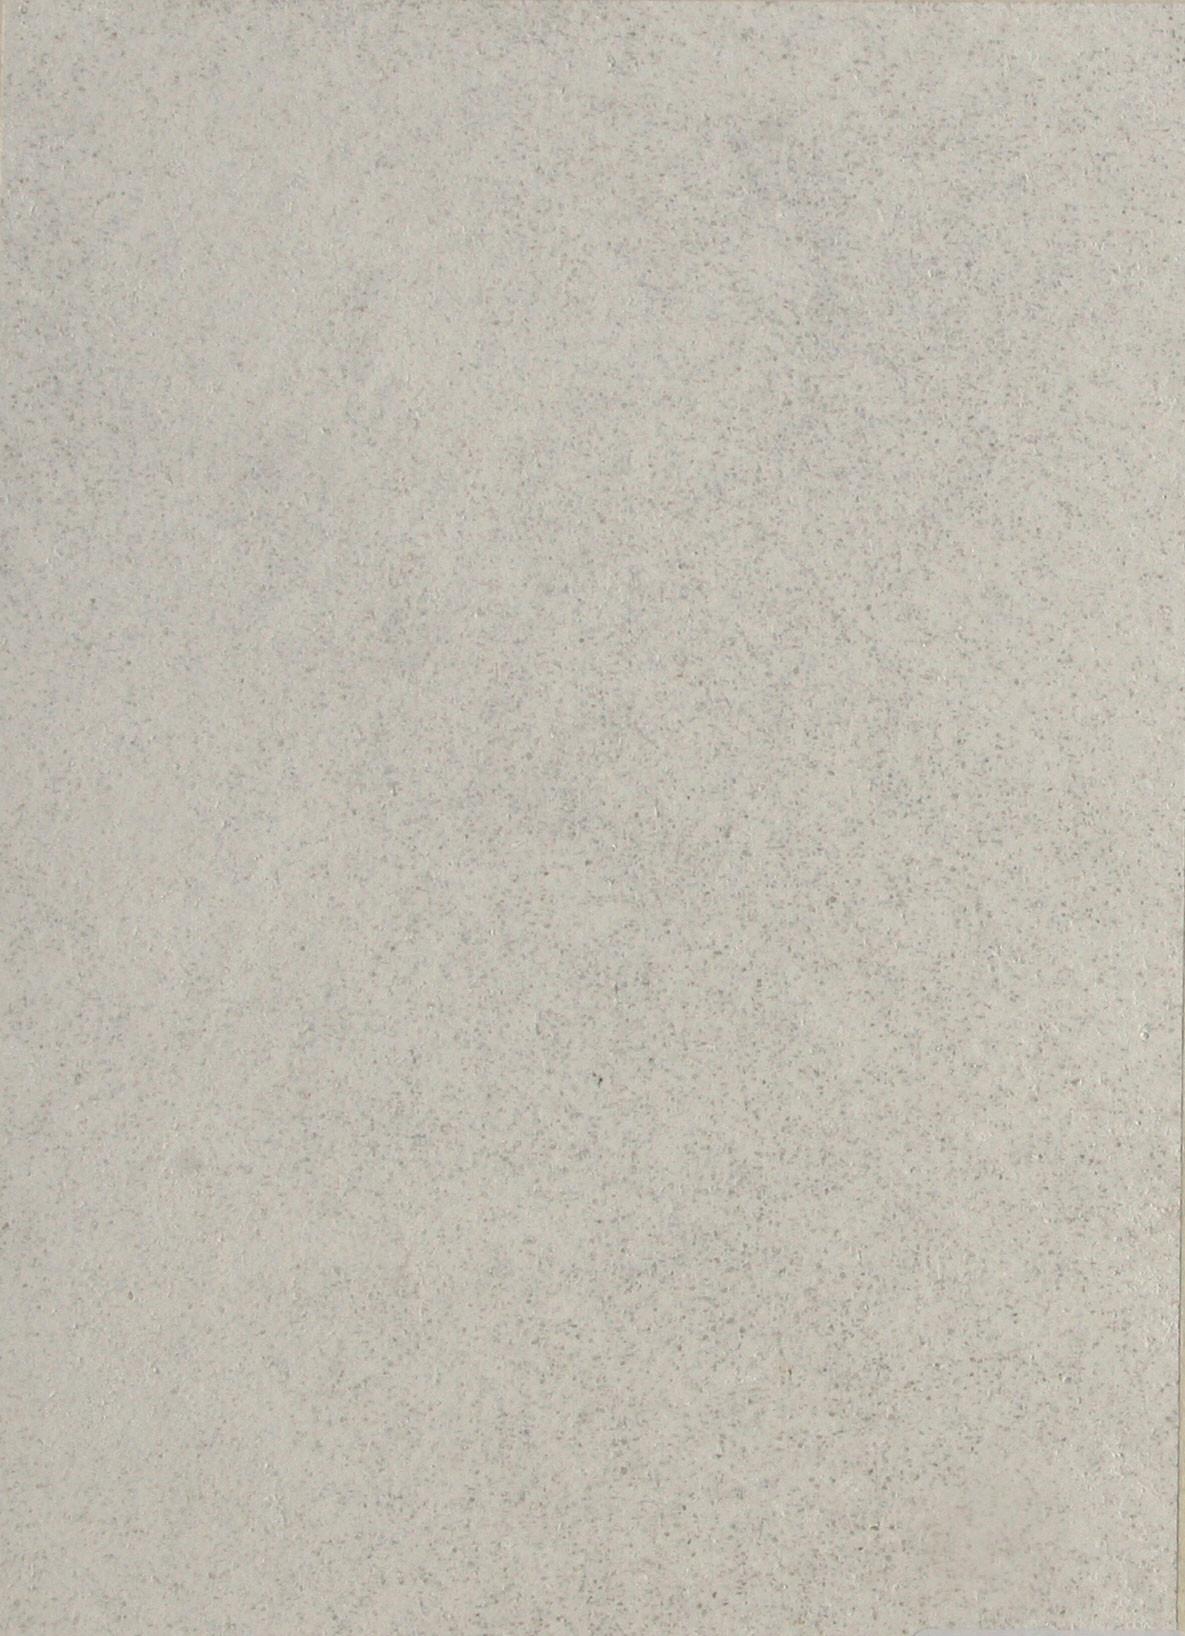 Enduit la chaux marmorino polvere di stelle 1kg 0 5m2 for Enduit a la chaux